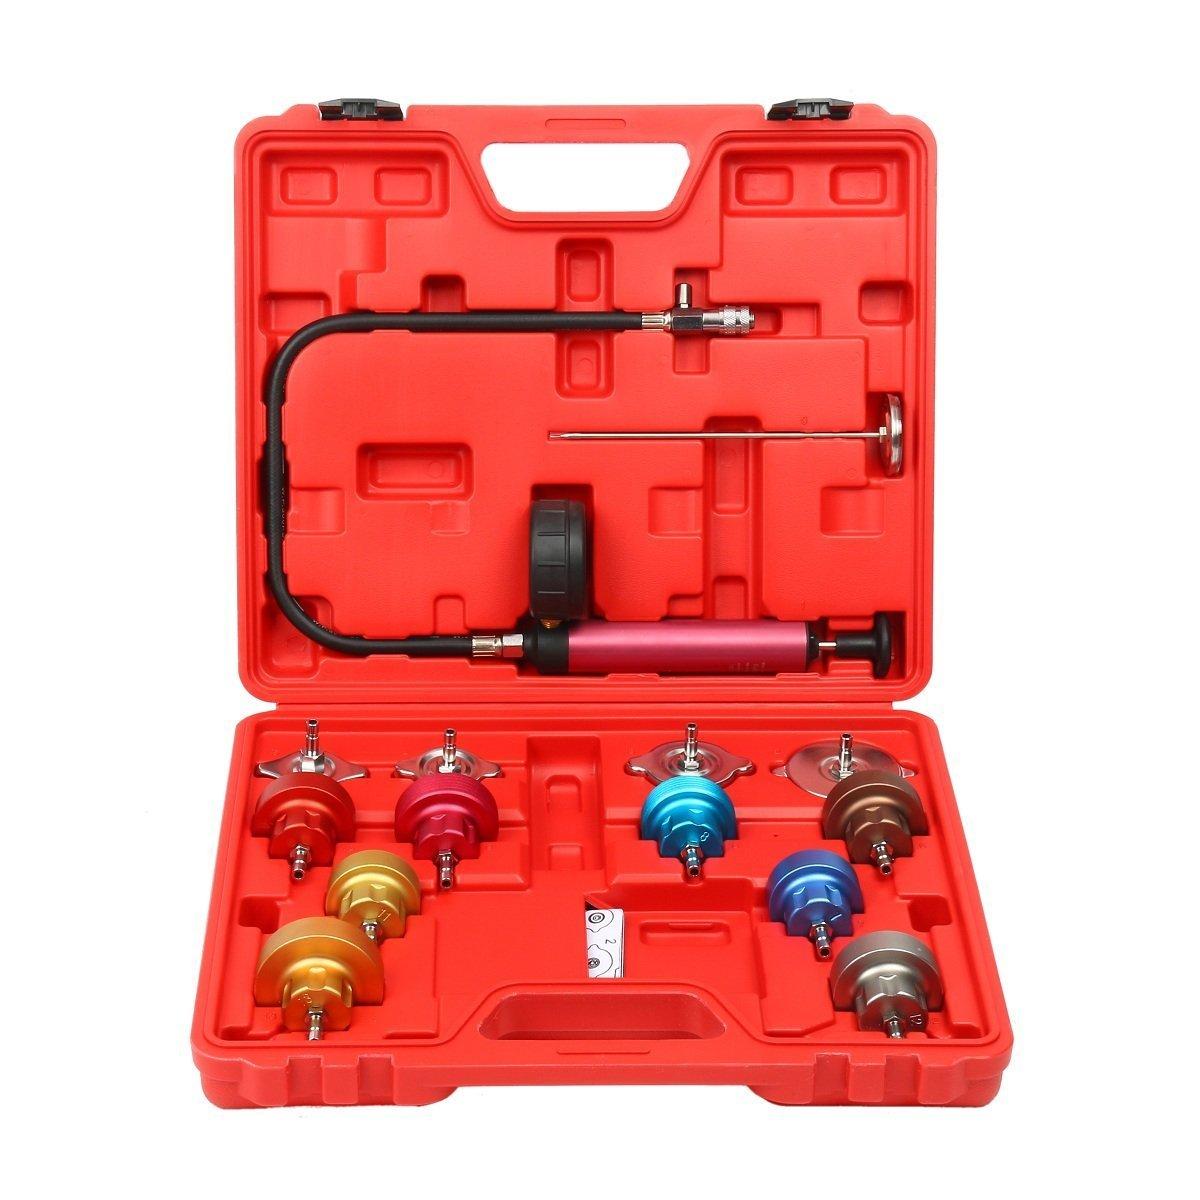 8MILELAKE 14 PCs Pressure Cooling System car Leak Tester Kit Detector Tool Auto Coolant Vacuum Purge Head Gasket Water Tank Adapter Universal Automotive